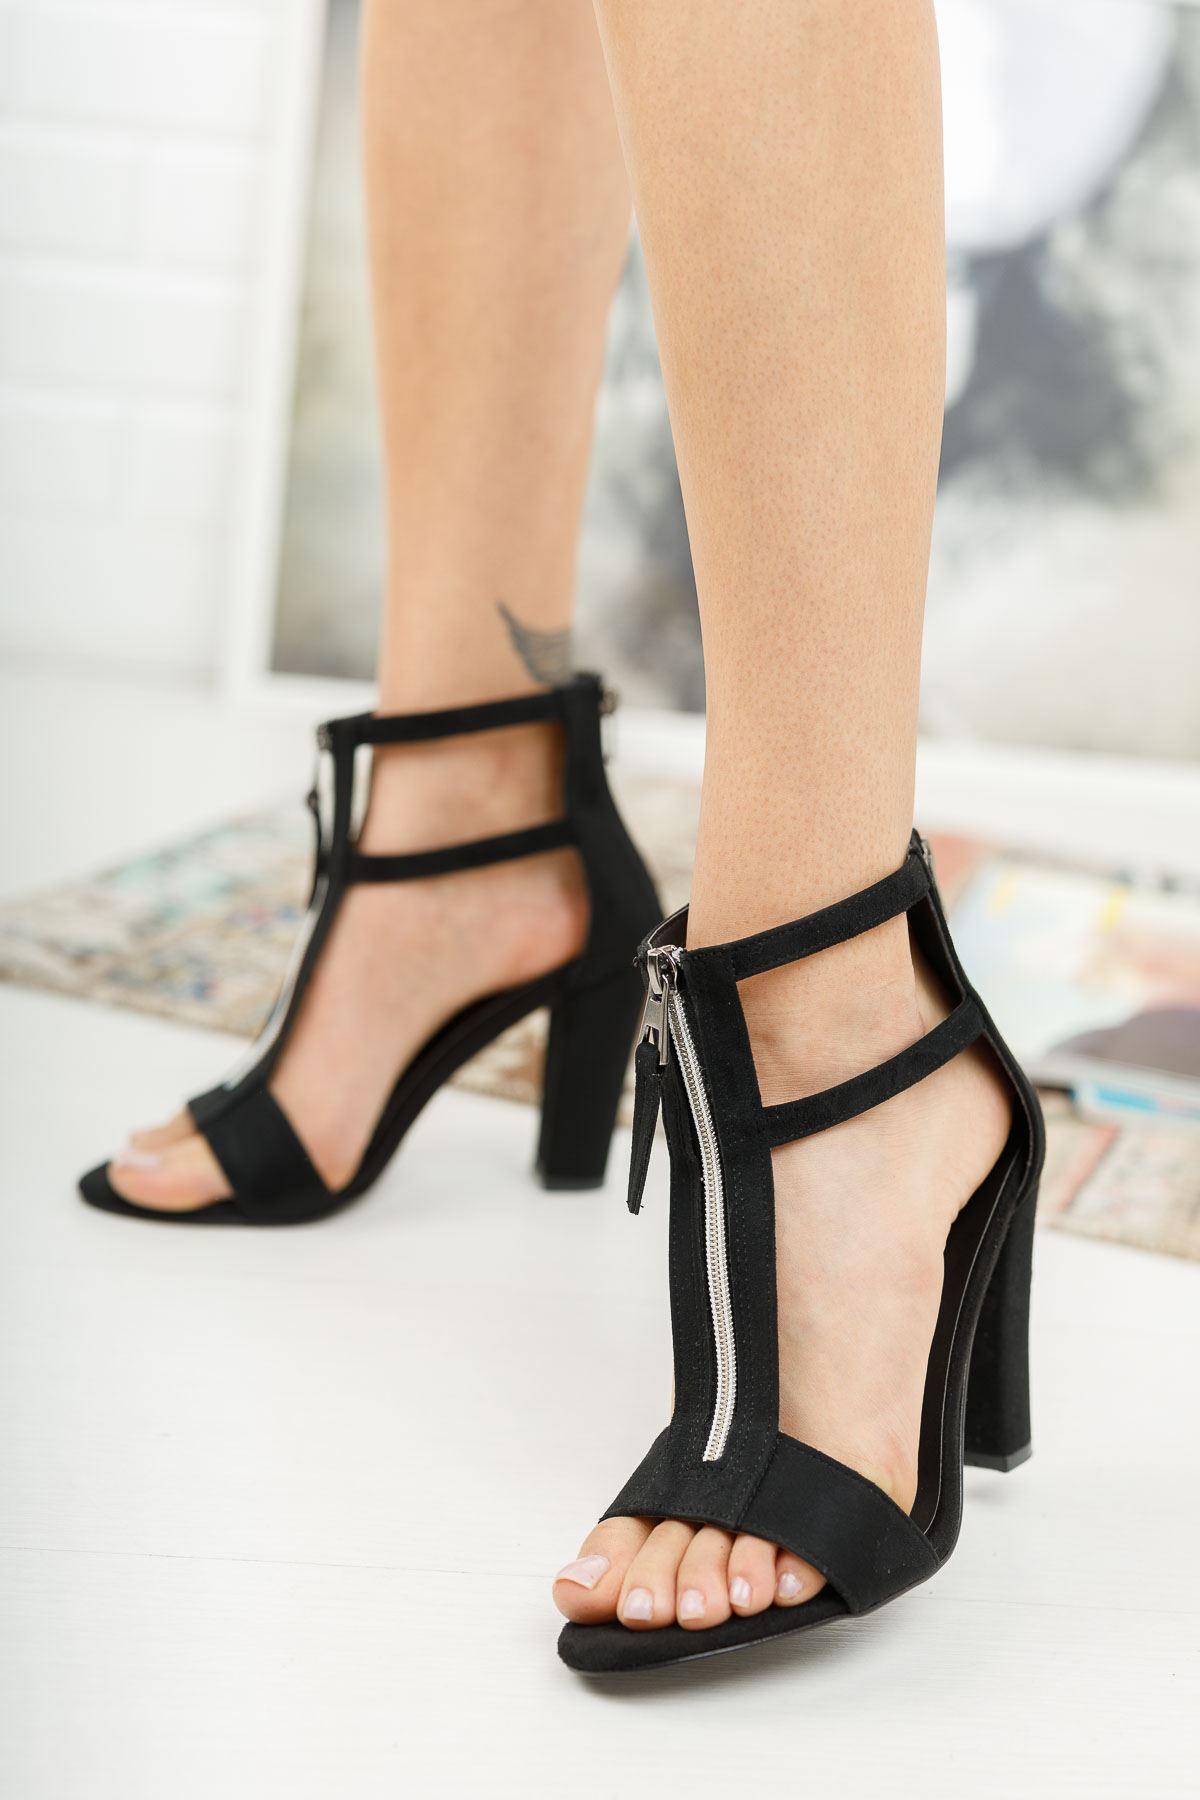 Rein Siyah Süet Topuklu Ayakkabı